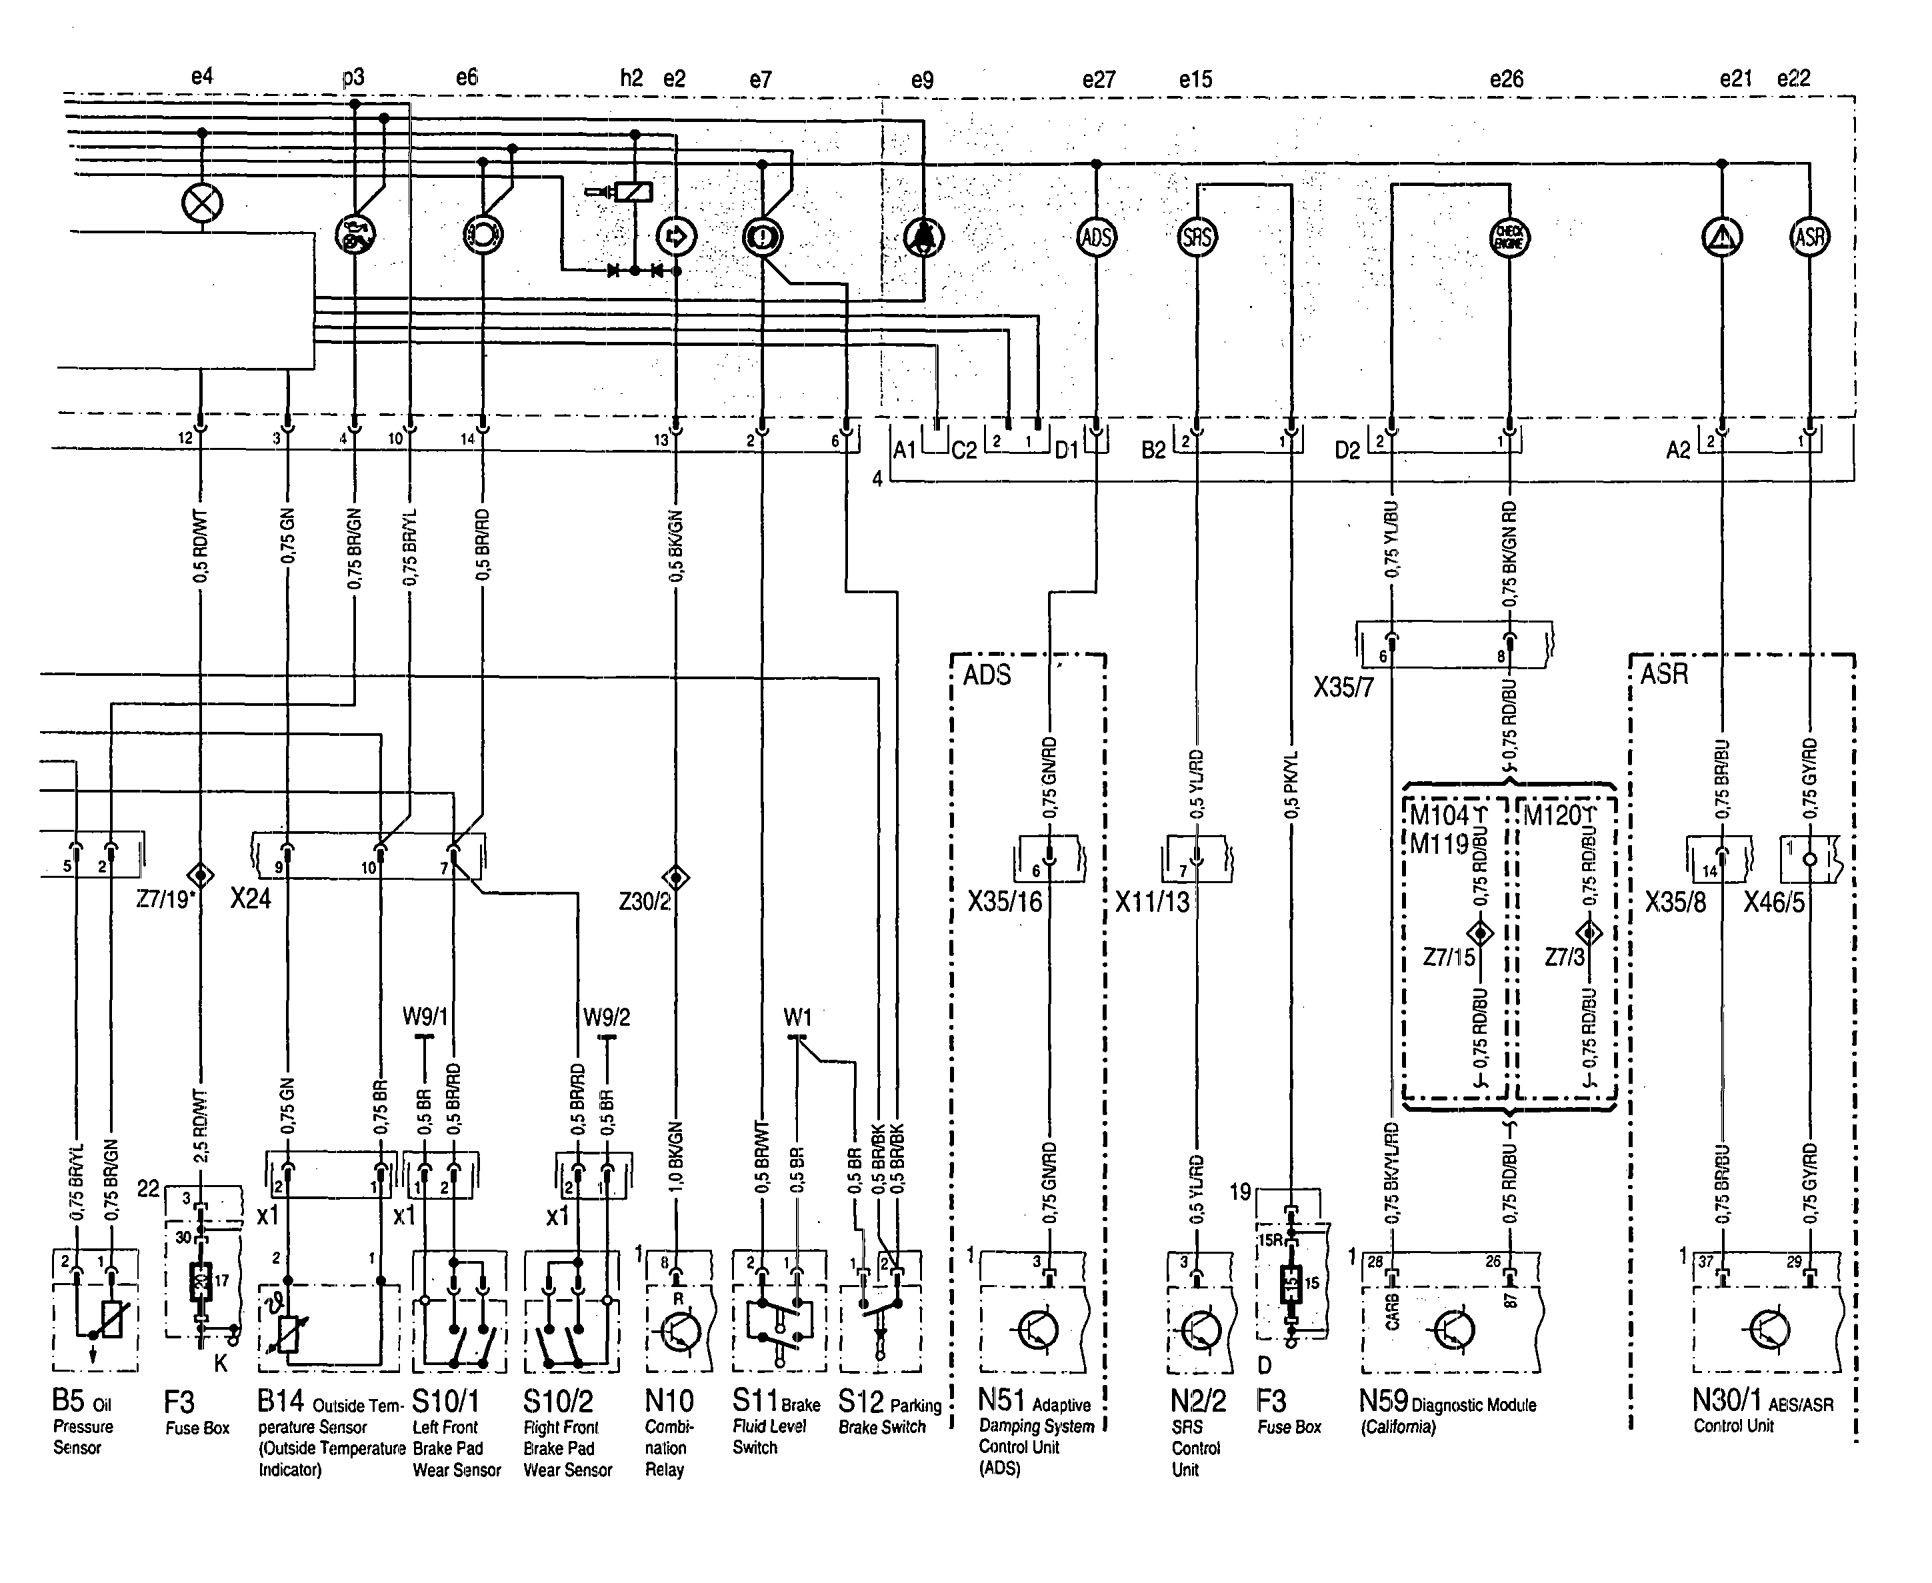 w124 500e wiring diagram sv650 headlight mercedes benz 500sel 1992 1993 diagrams